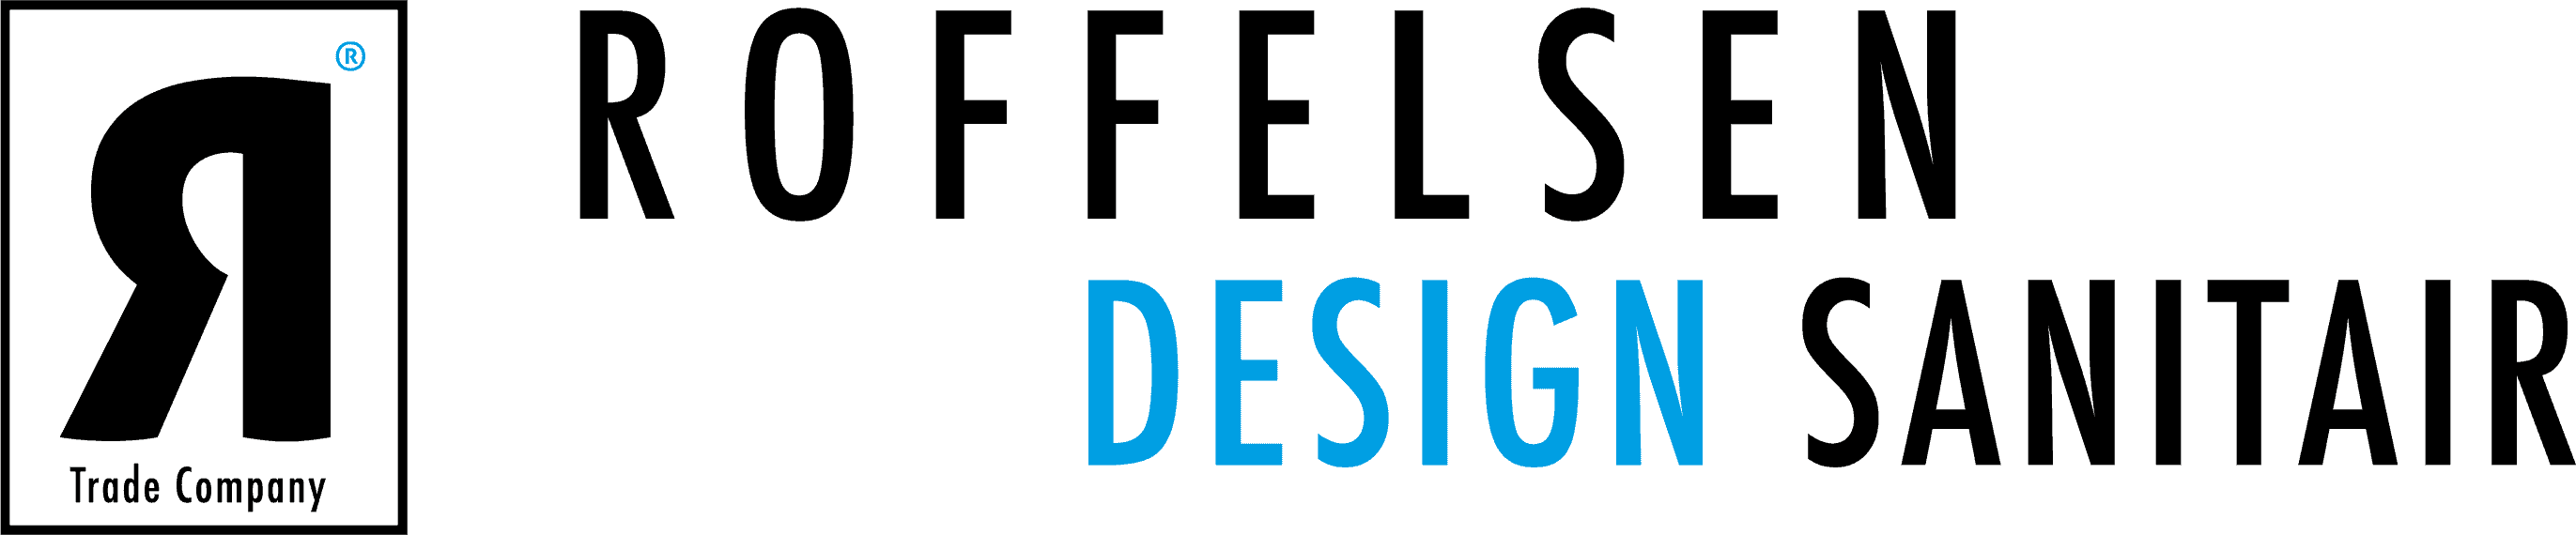 Roffelsen Design Sanitair